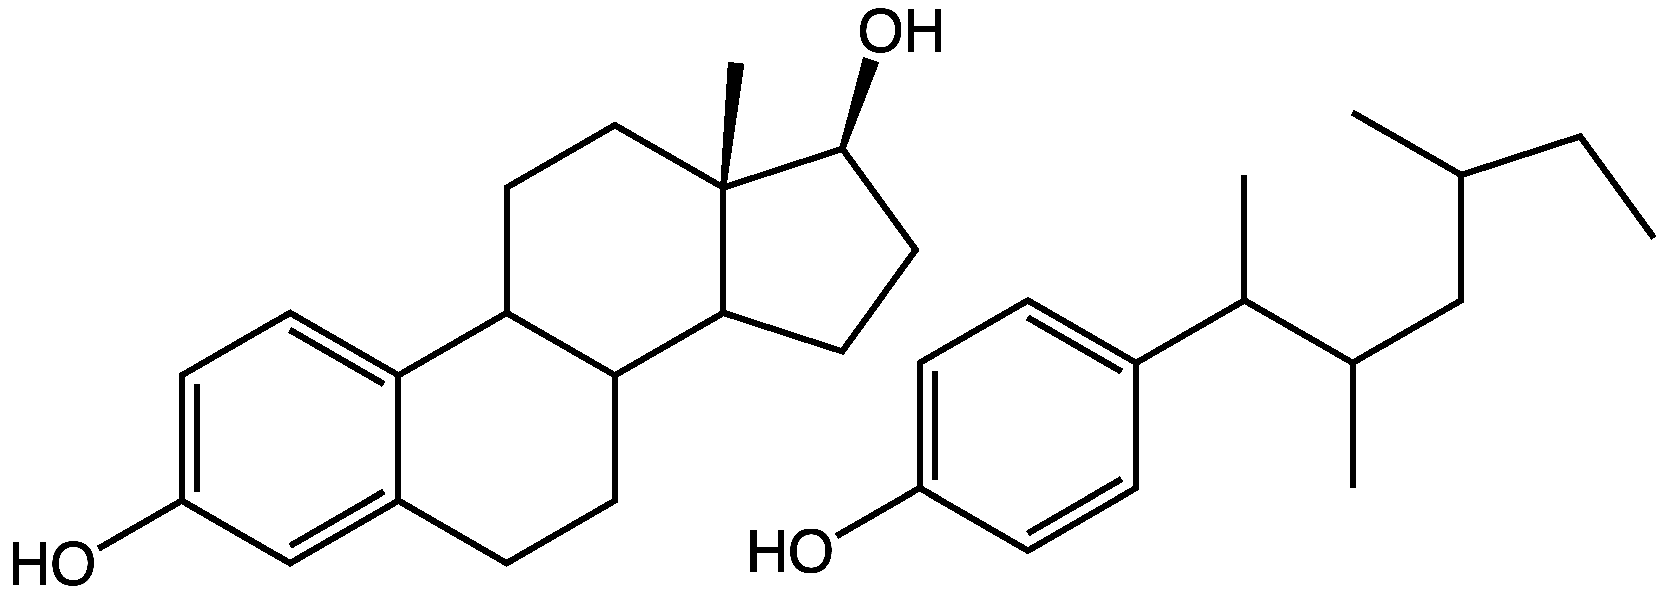 Endocrine disruptor - Wikipedia